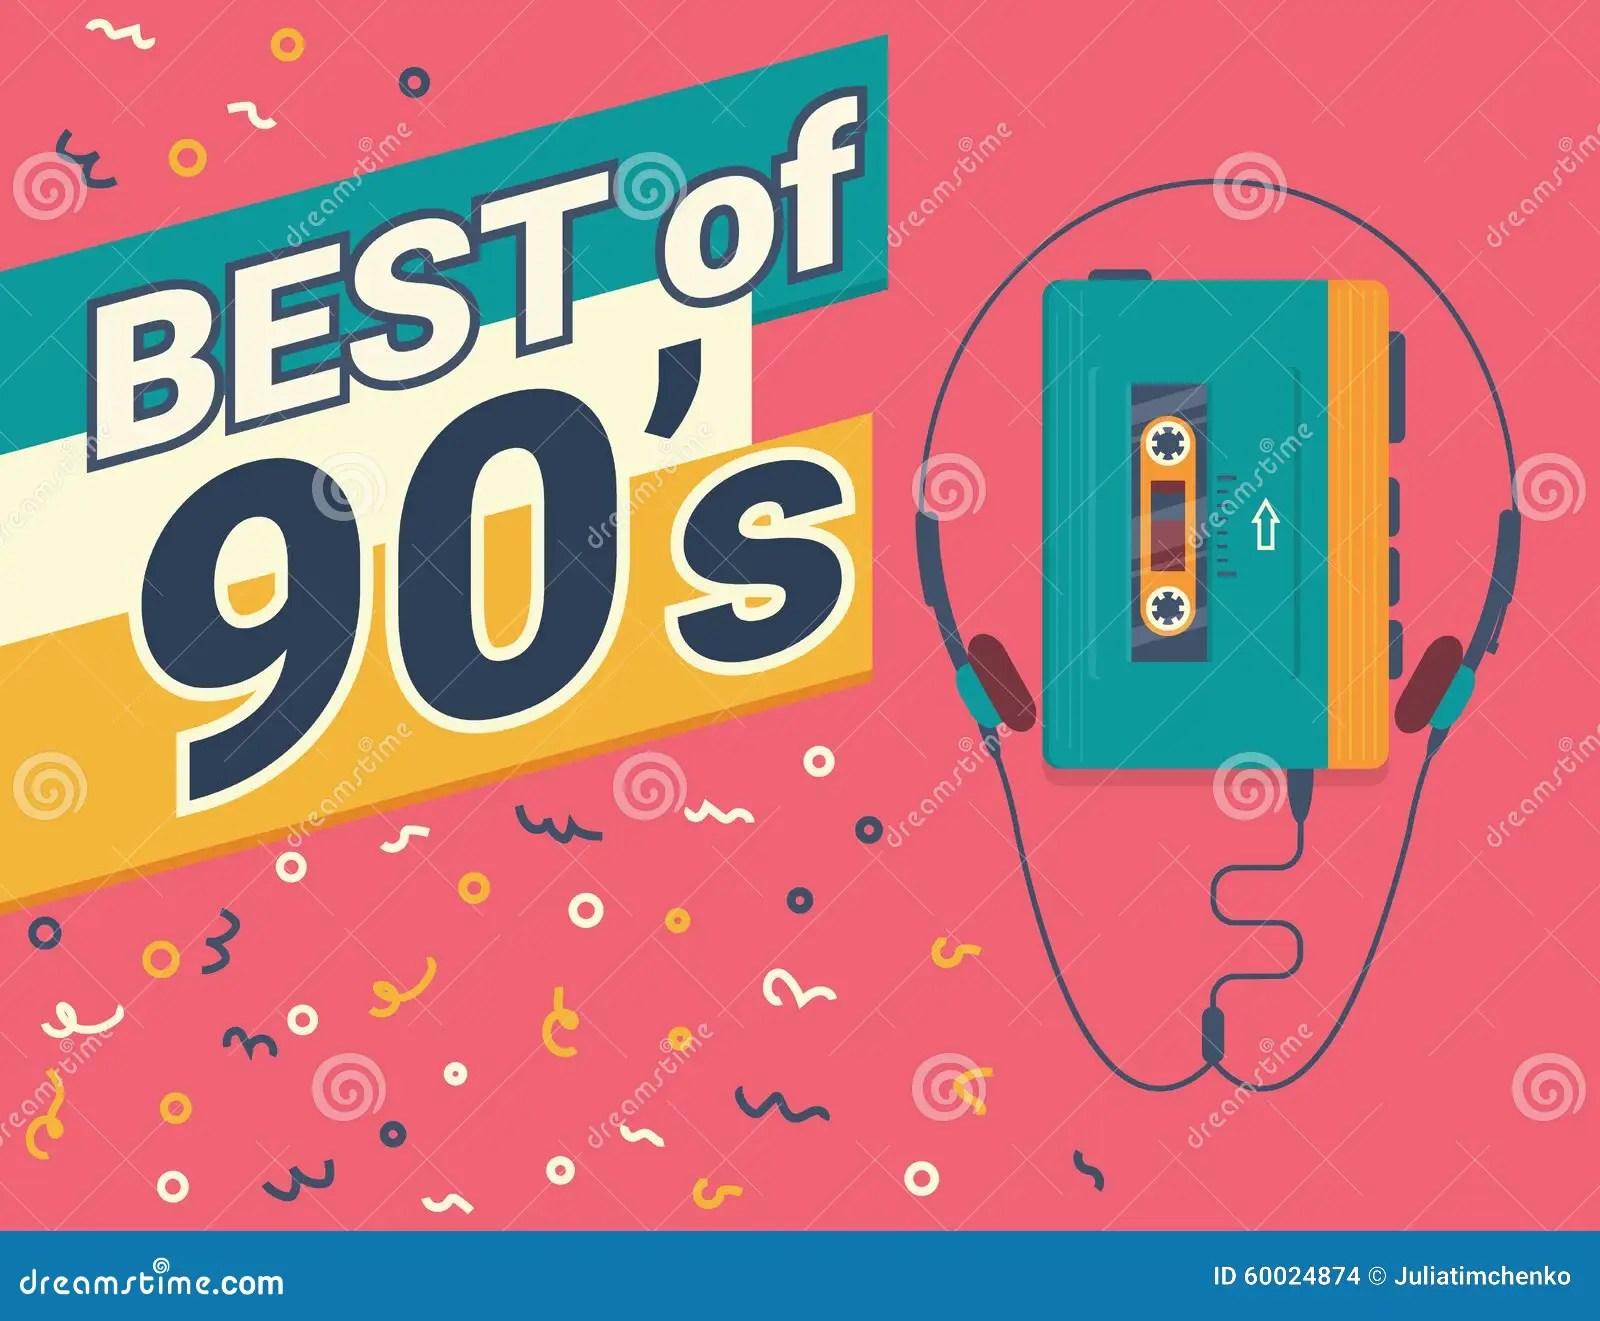 Retro 80s Music List - Modern Home Revolution